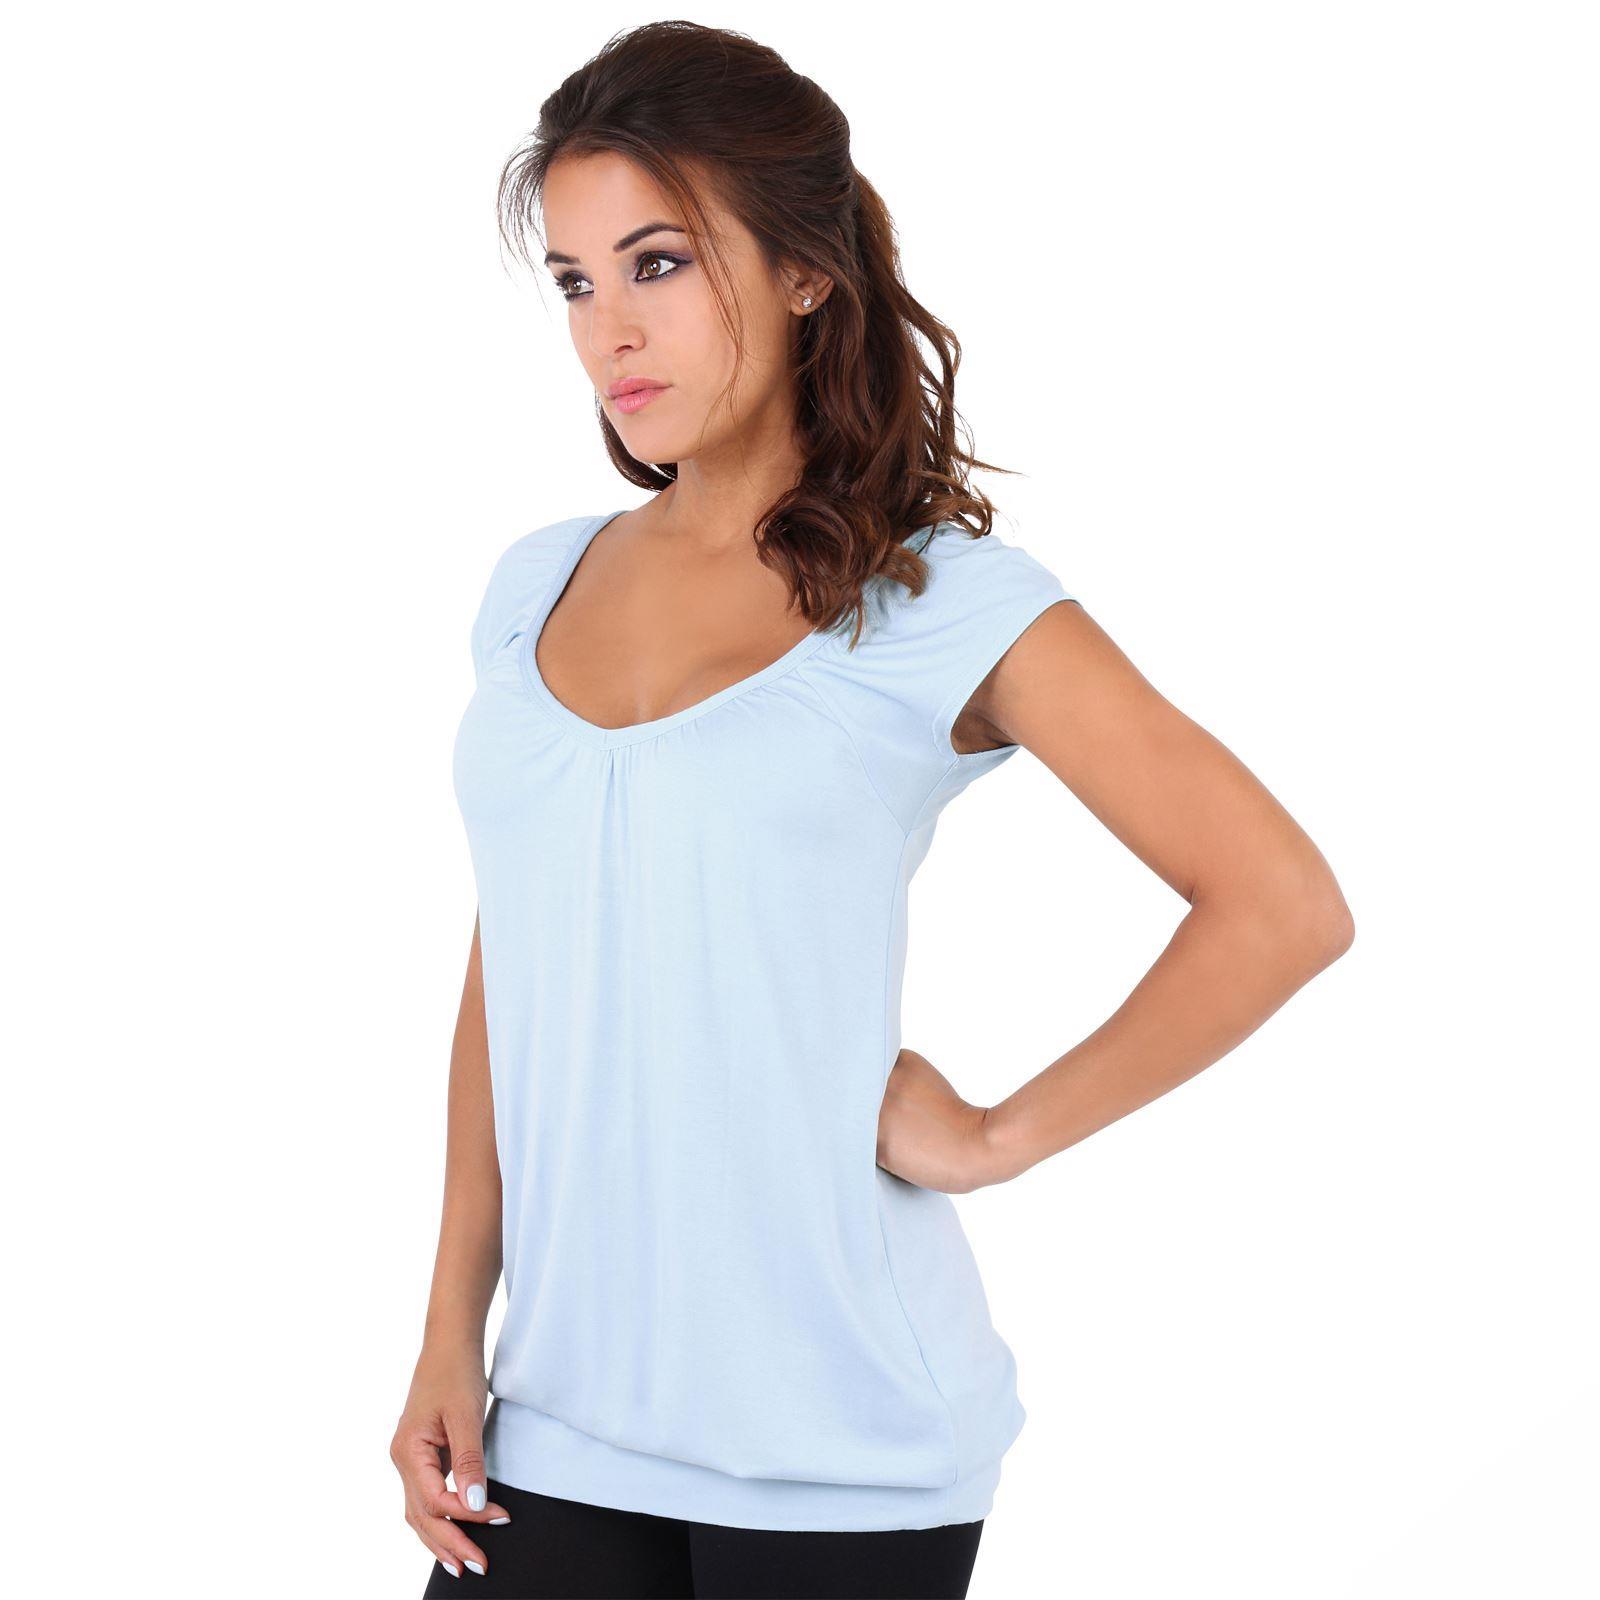 Womens-Ladies-Plain-T-Shirt-Short-Sleeve-Long-Loose-V-Neck-Blouse-Tunic-Top thumbnail 4